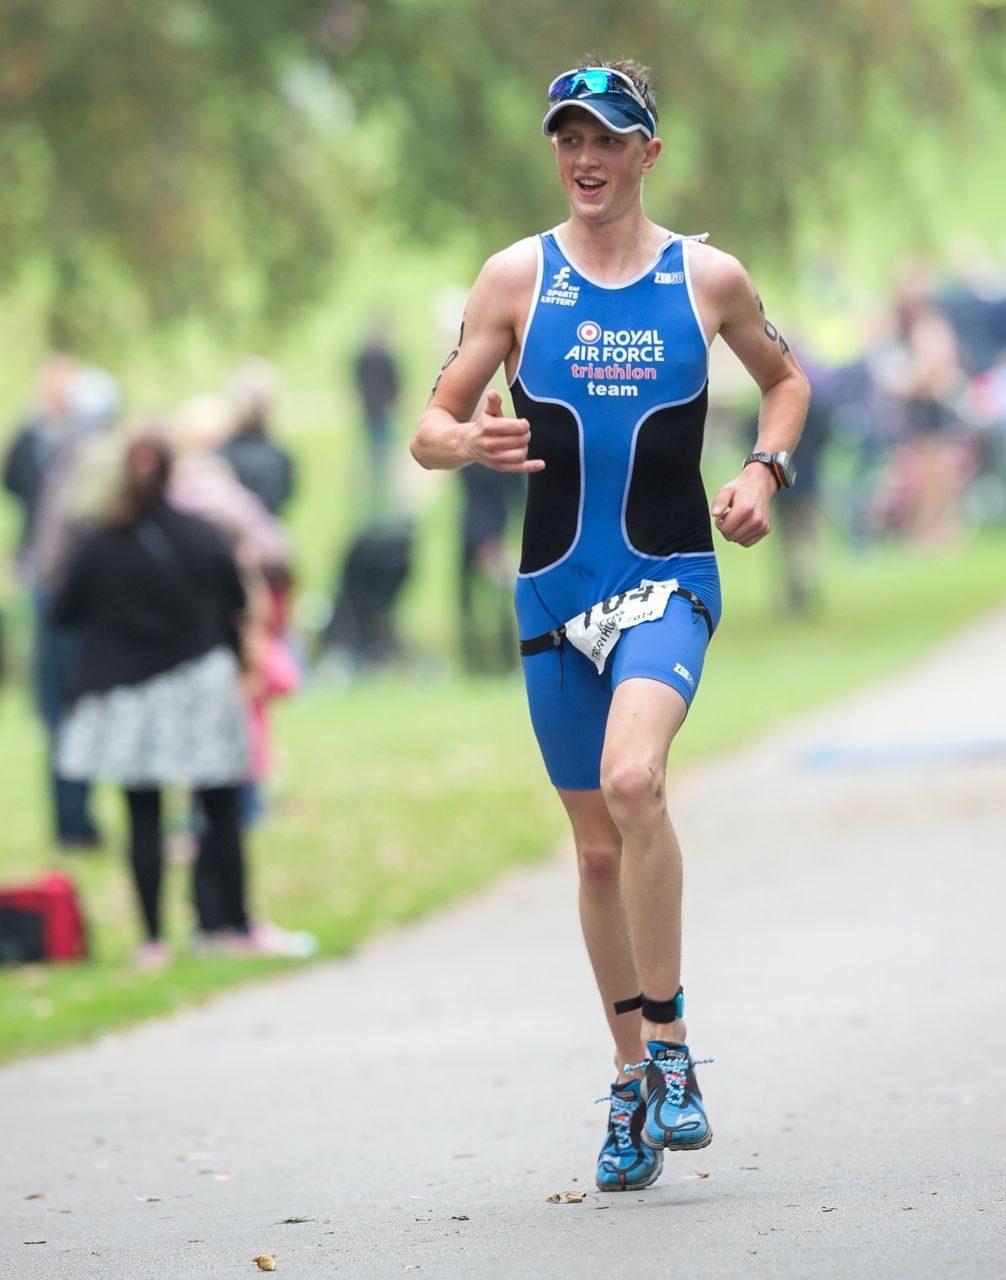 Luke Pollard wins standard distance race at Leeds Triathlon 2014